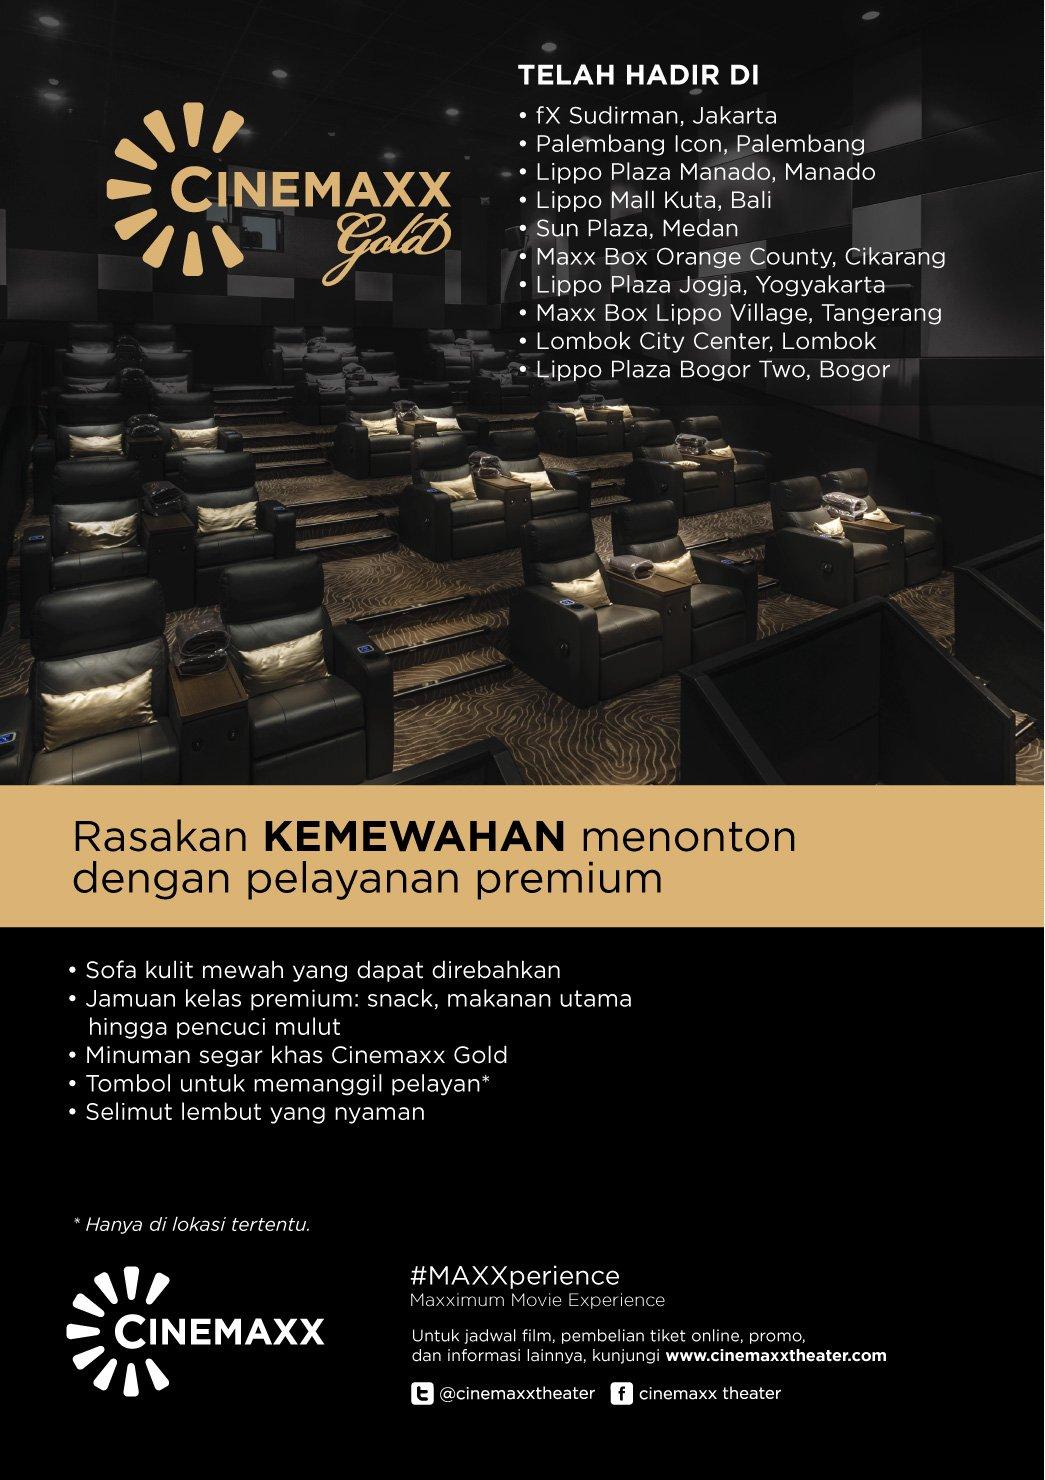 Jadwal Bioskop Lippo Jogja : jadwal, bioskop, lippo, jogja, Cinemaxx, Bogor